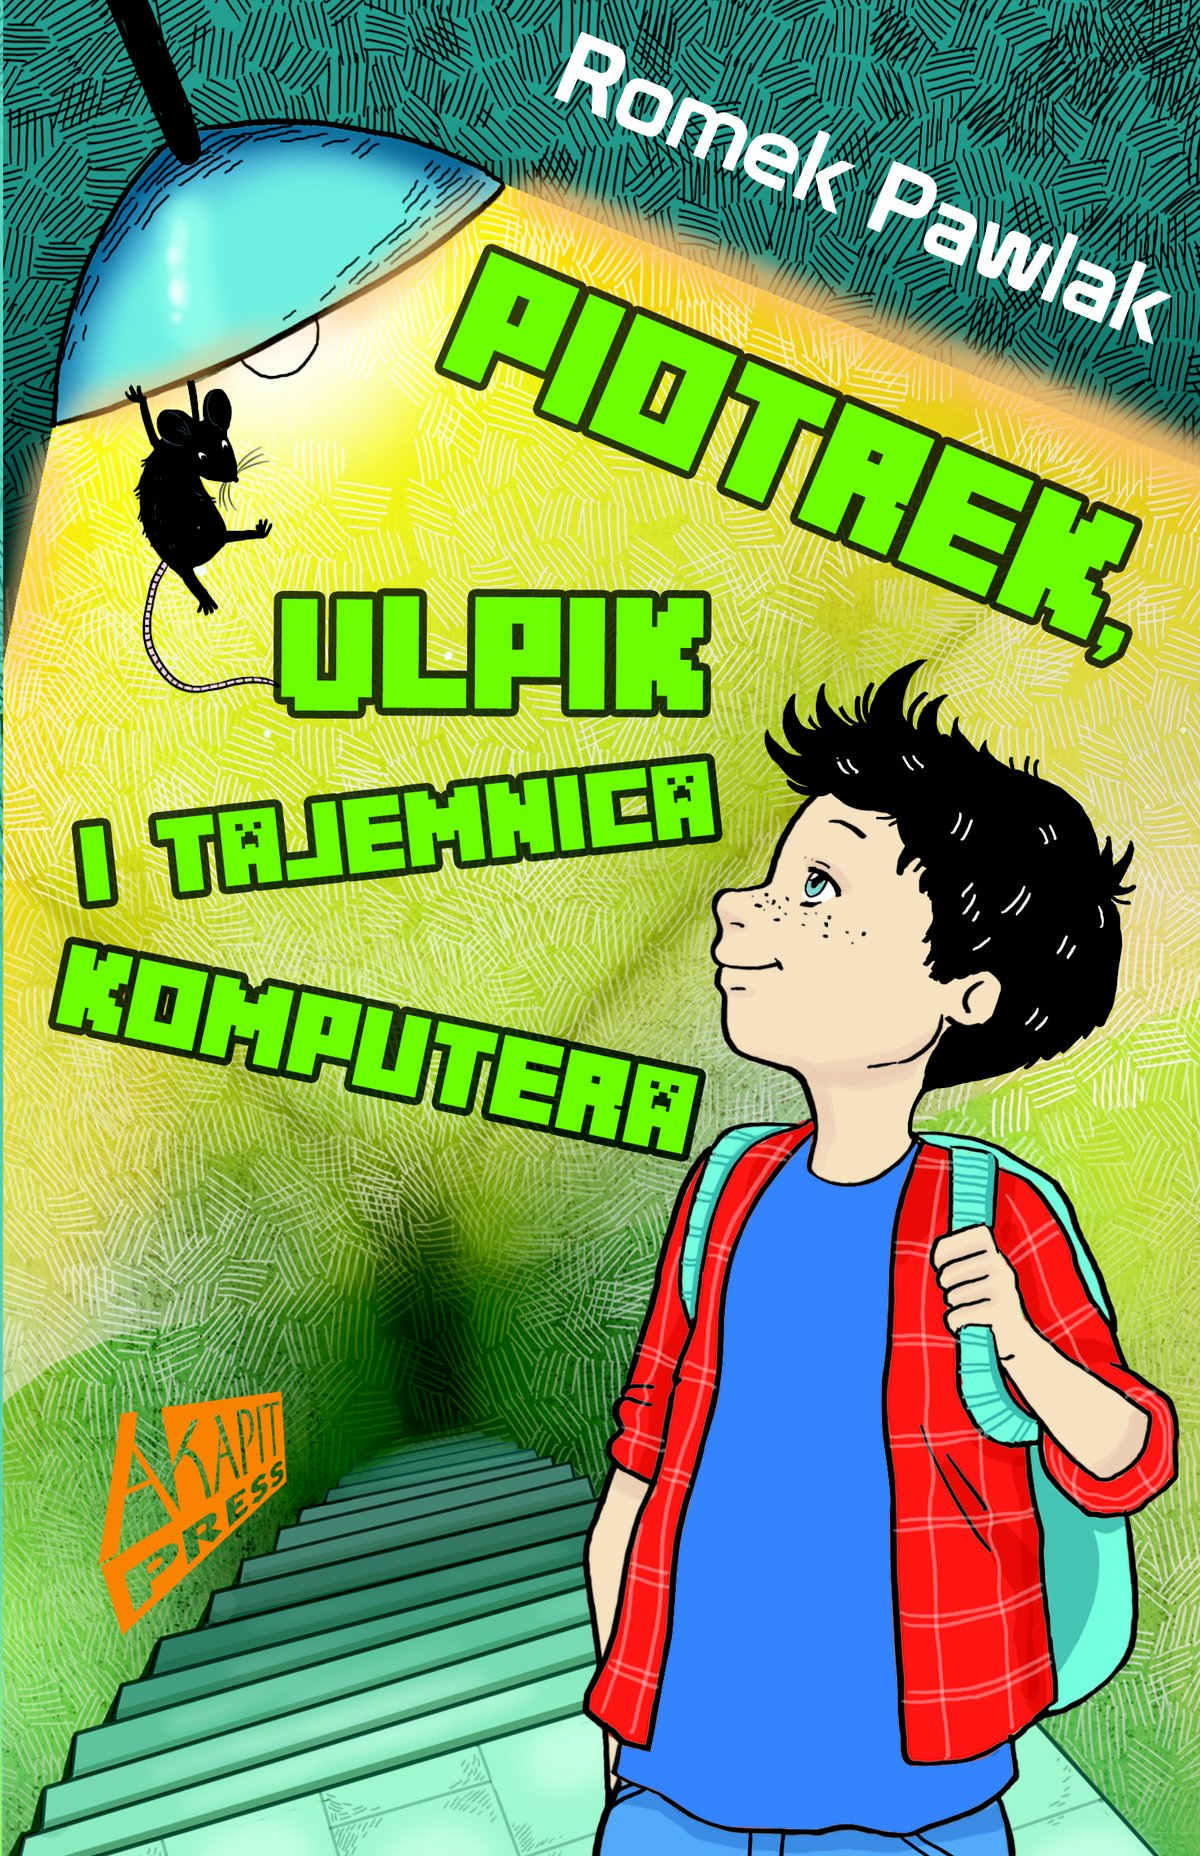 Piotrek, Ulpik i tajemnica komputera - Ebook (Książka na Kindle) do pobrania w formacie MOBI